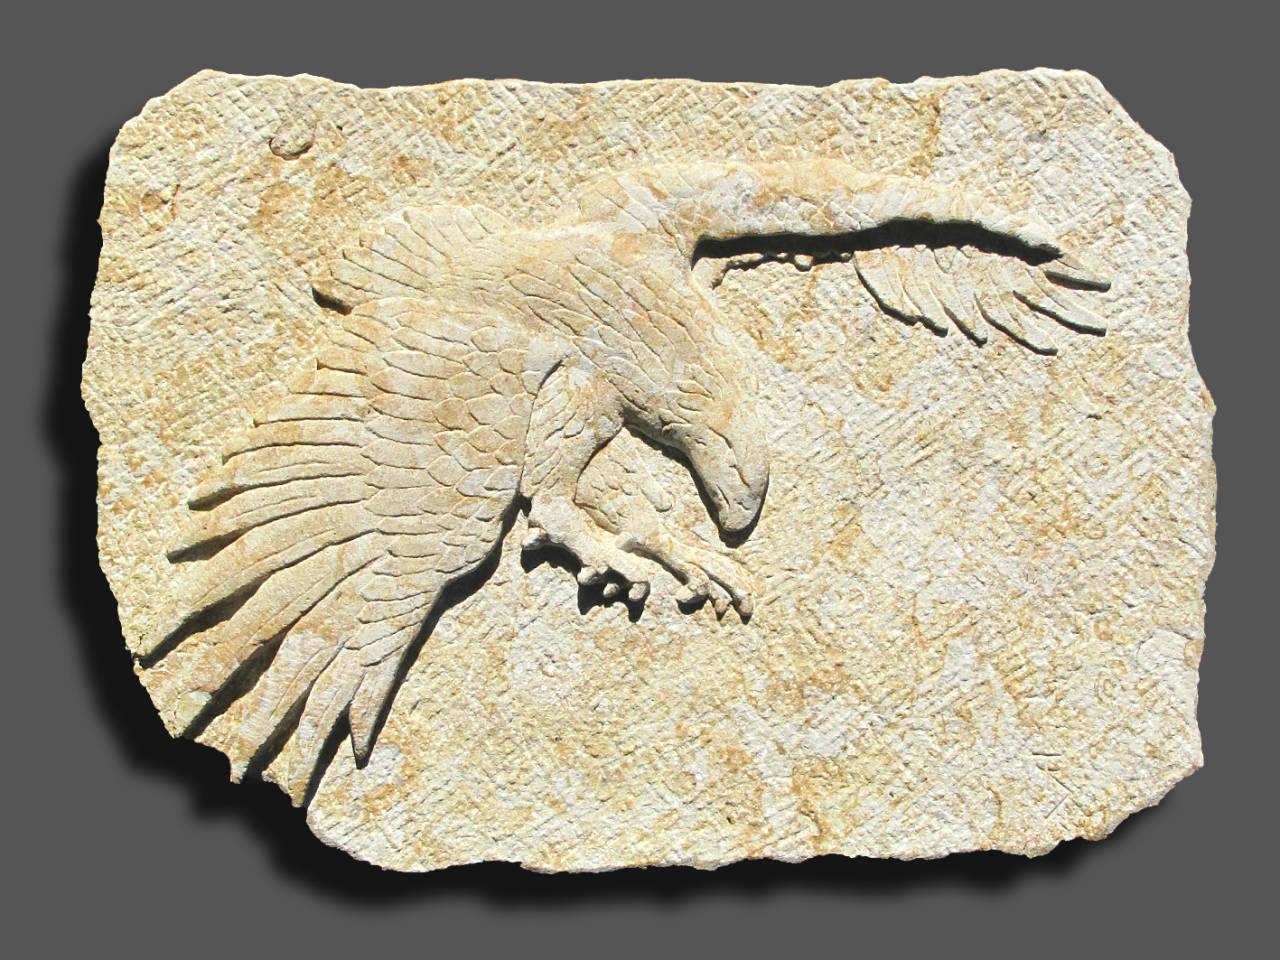 Adler im Flug, Sandstein